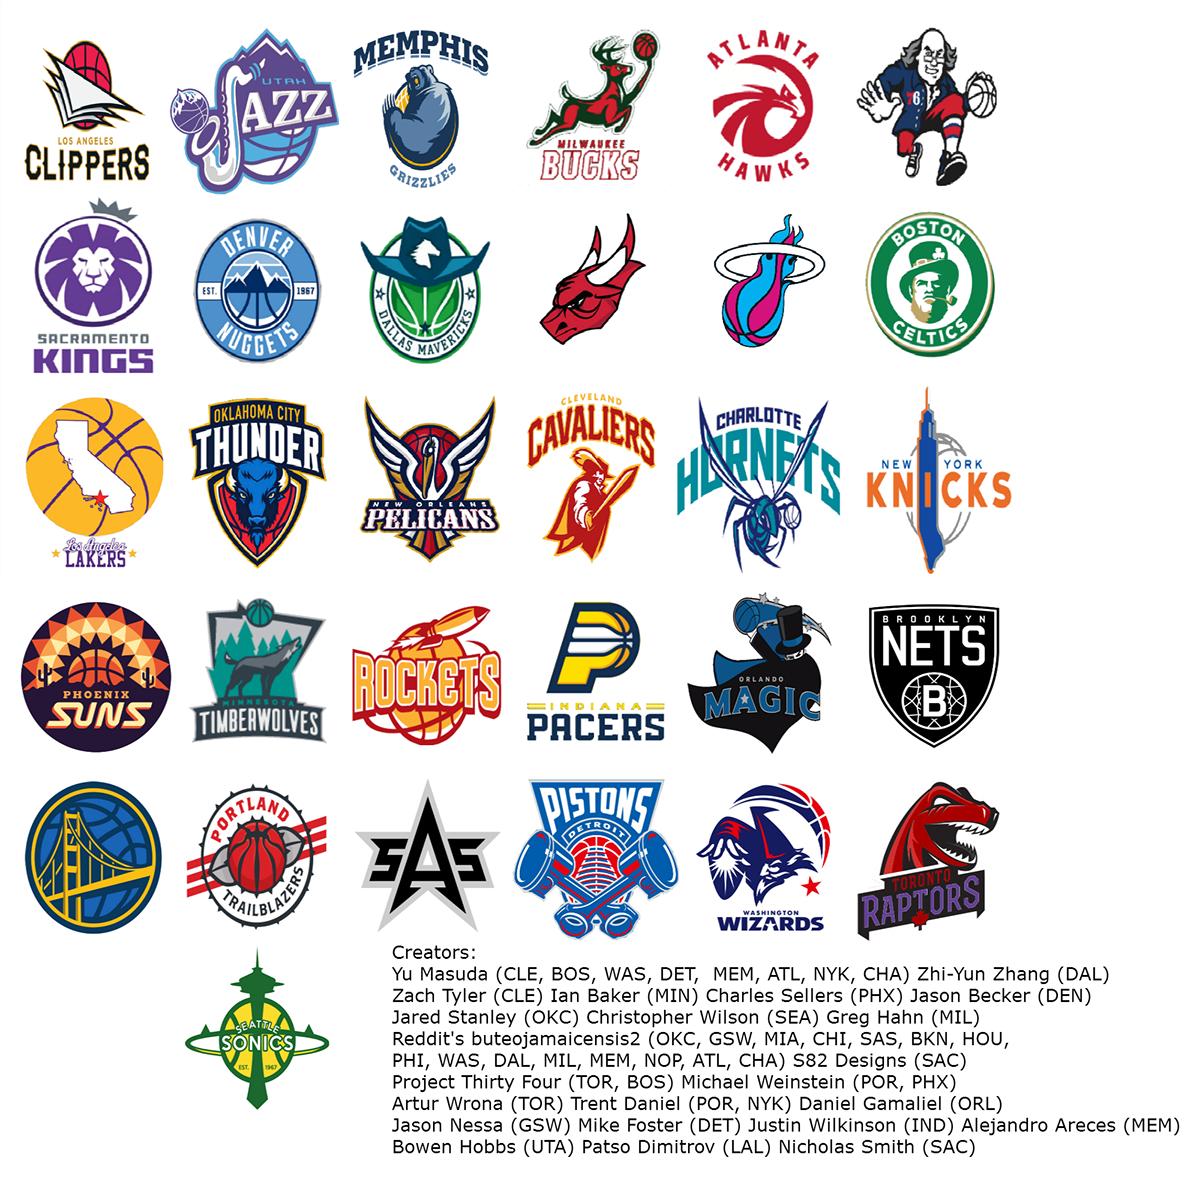 Nba Teams: Every NBA Team Redesigned On Behance